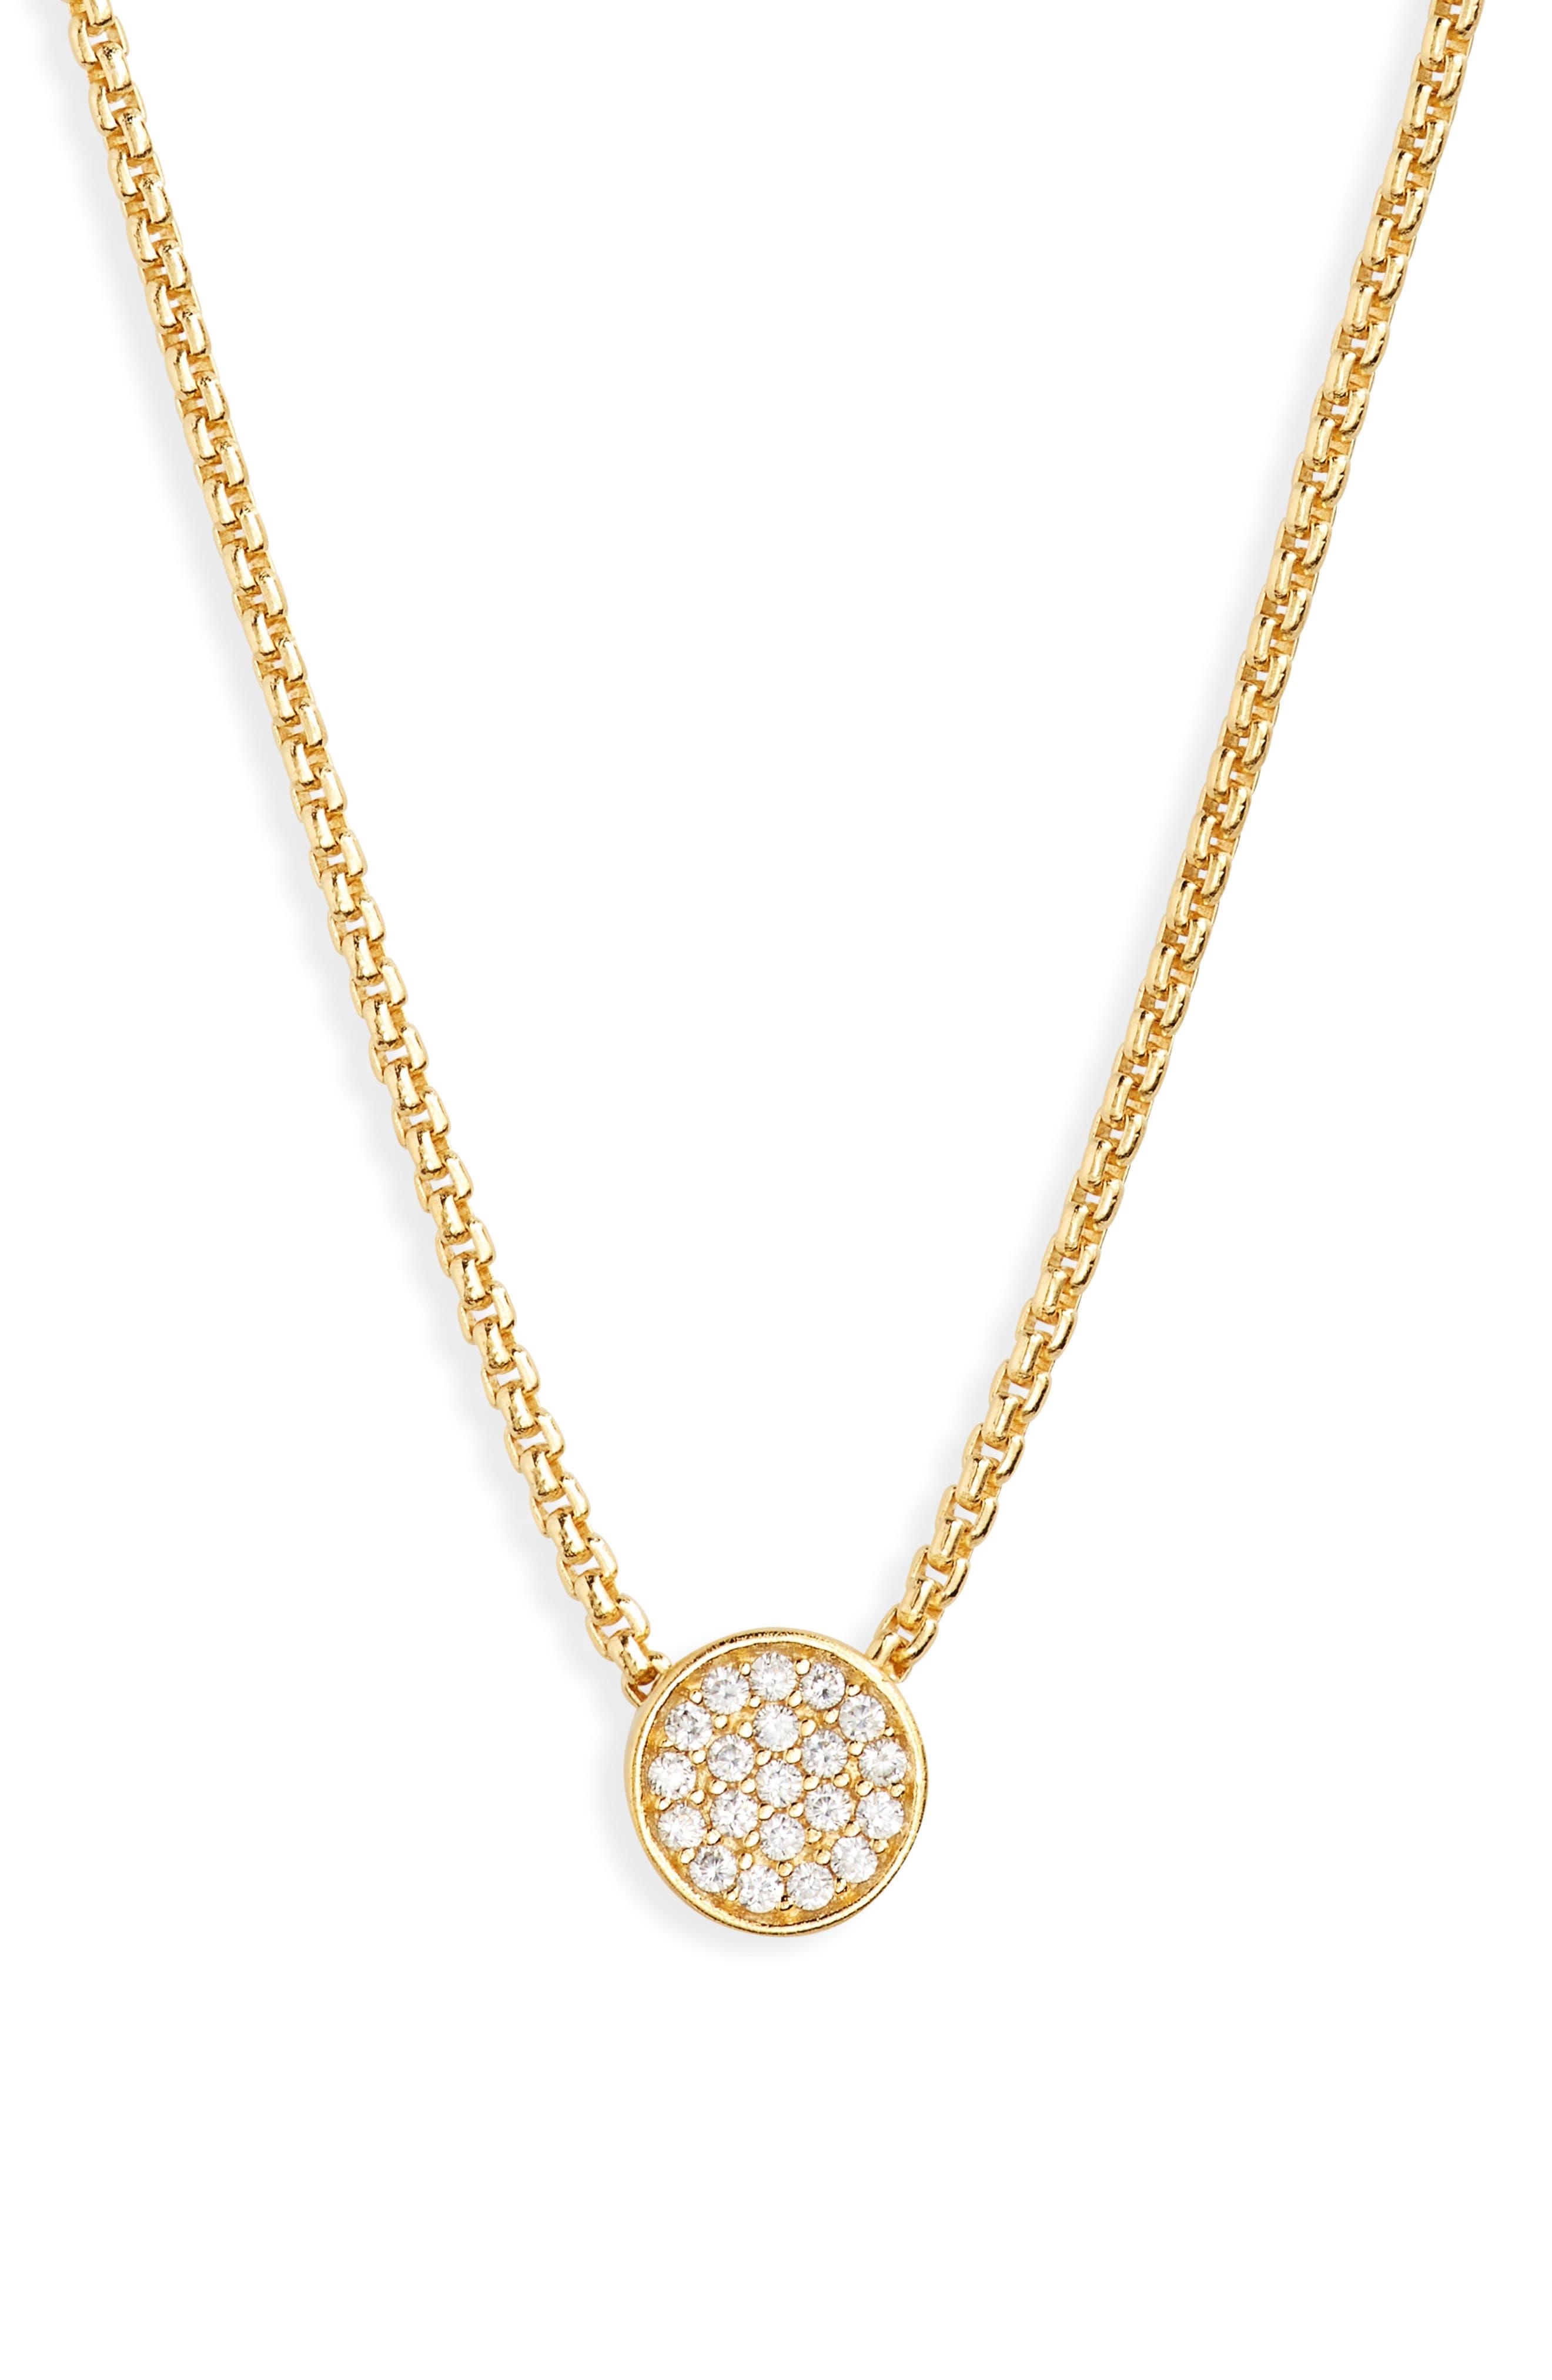 Signature Pave Pendant Necklace